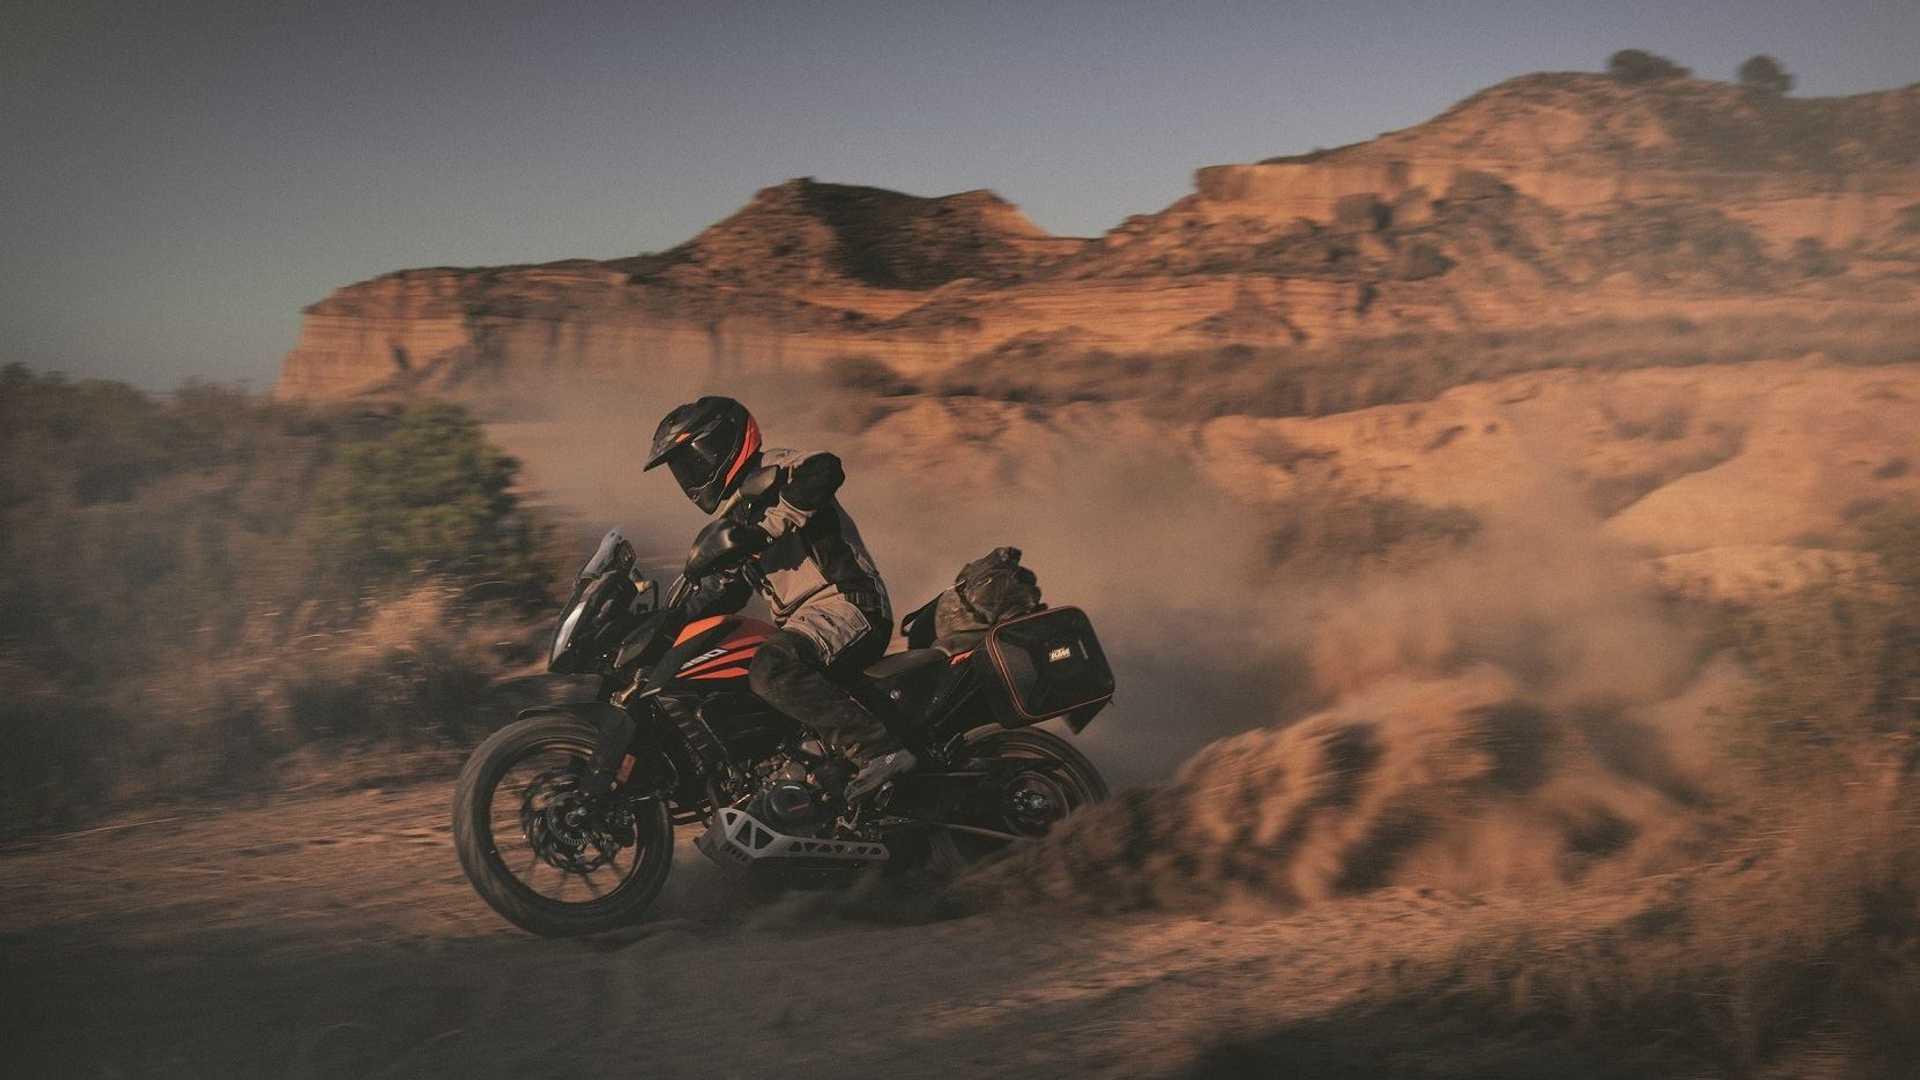 KTM Adventure tour,KTM Adventure tour,ktm adventure tours,ktm adventure tourer,ktm adventure tours india,ktm adventure touring bike,ktm adventure tours 2021,ktm adventure tours australia,ktm adventure tourer india,ktm adventure touring case set,ktm adventure tours morocco